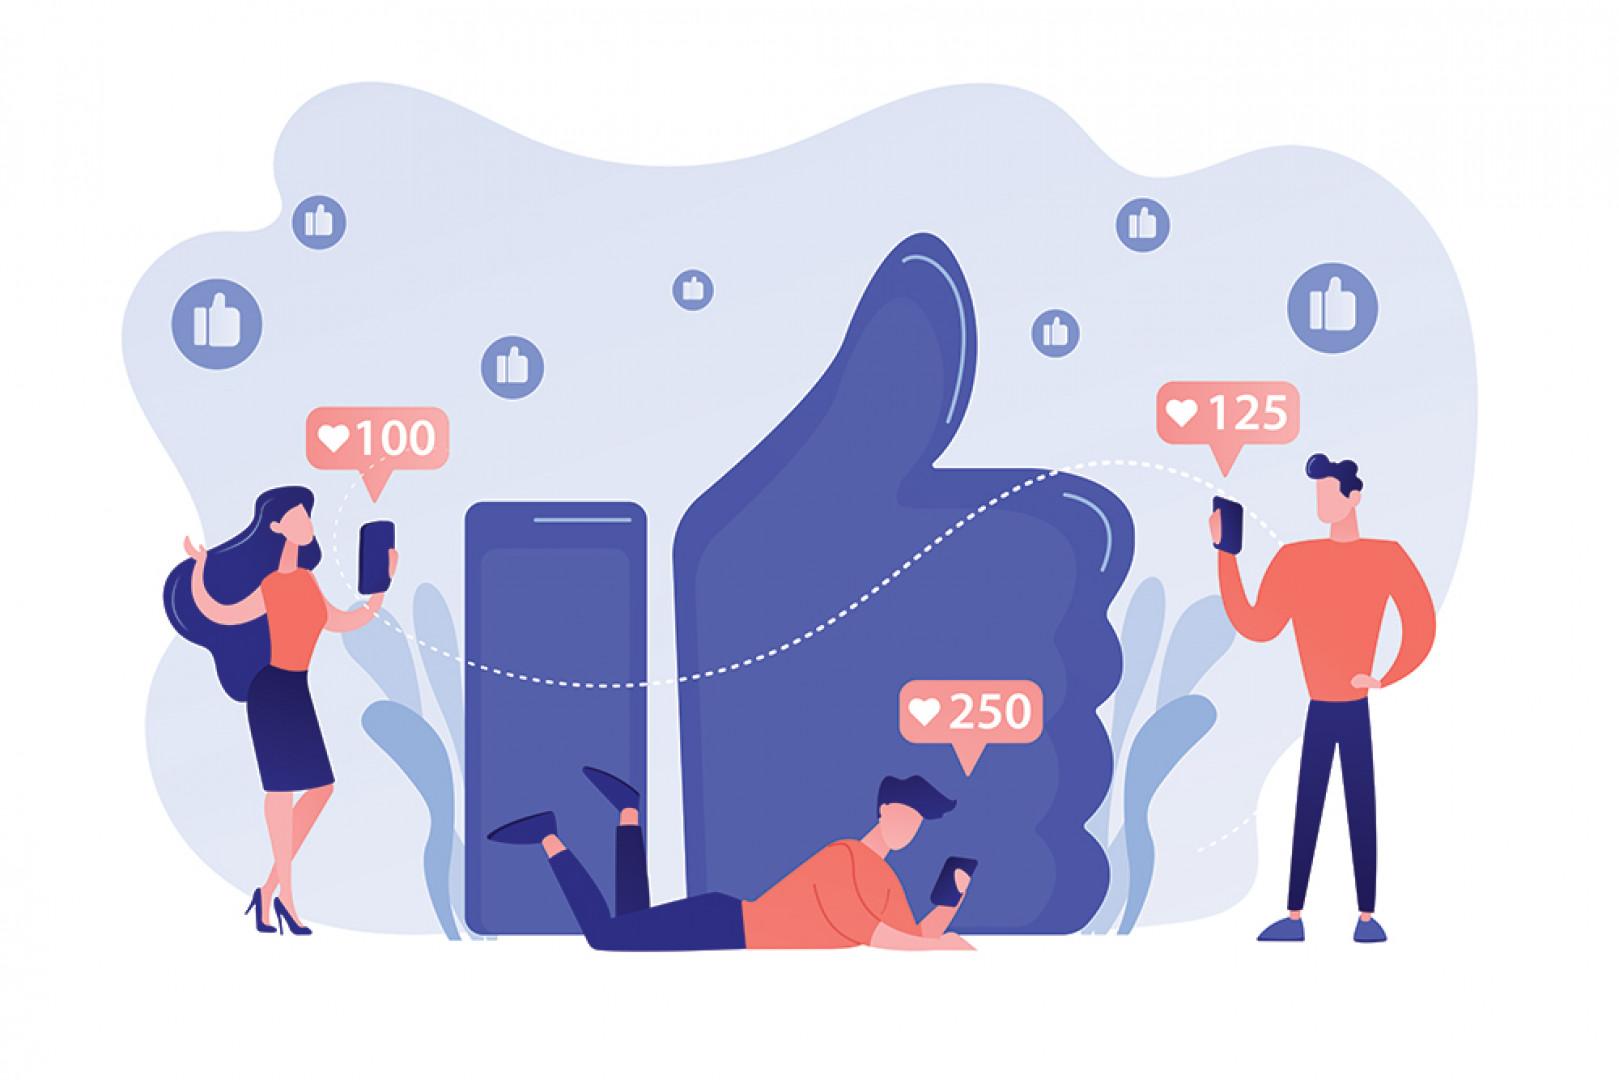 5 tips to be successful at social media marketing